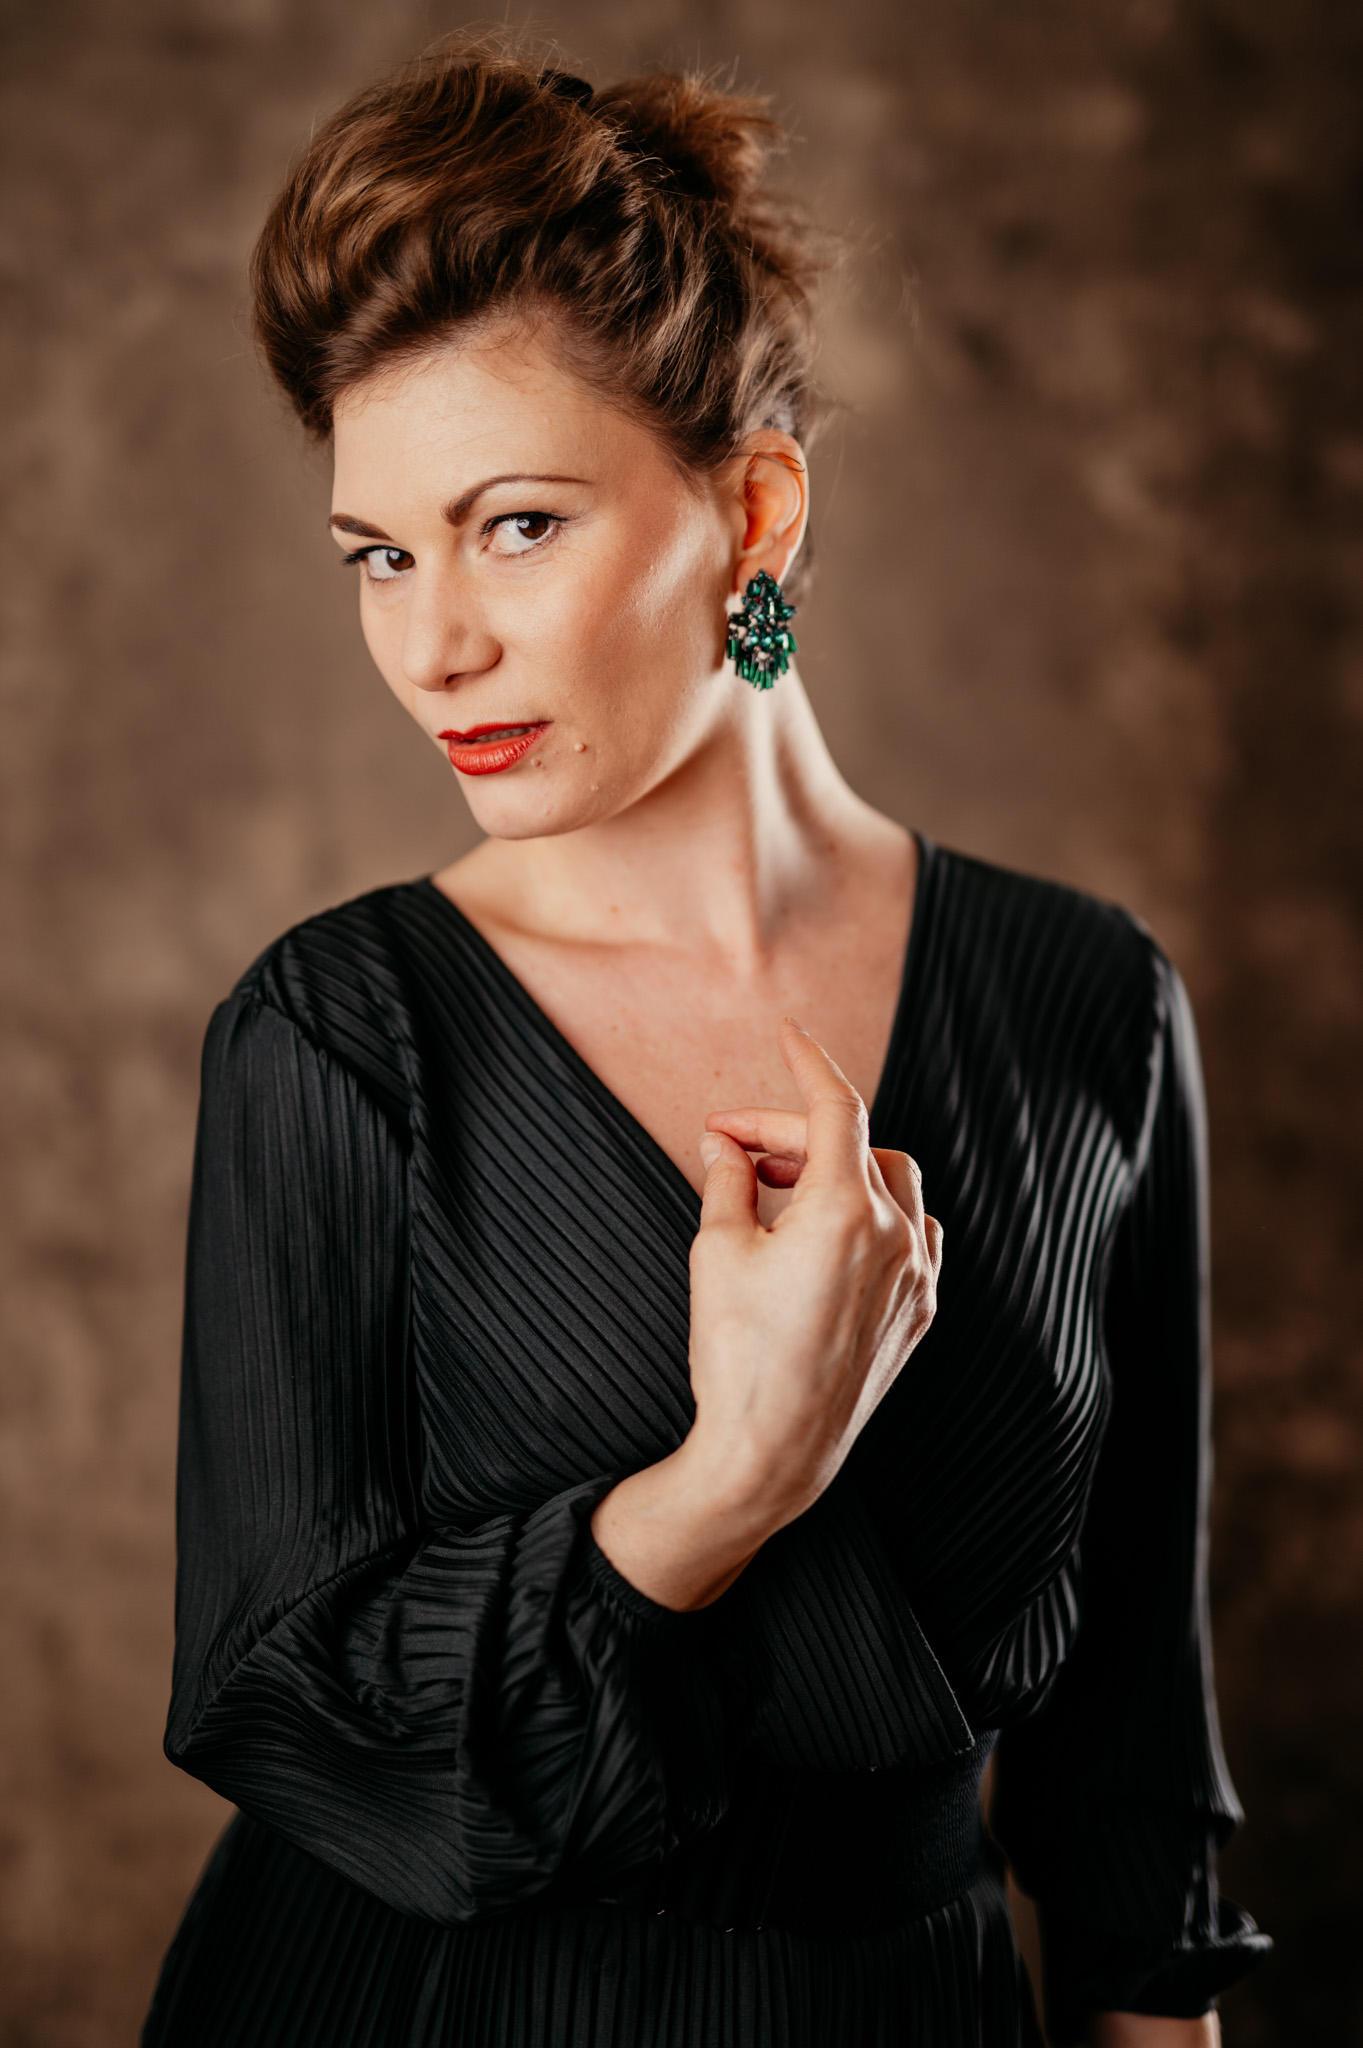 Schauspielerin Köln Bonn Sängerin